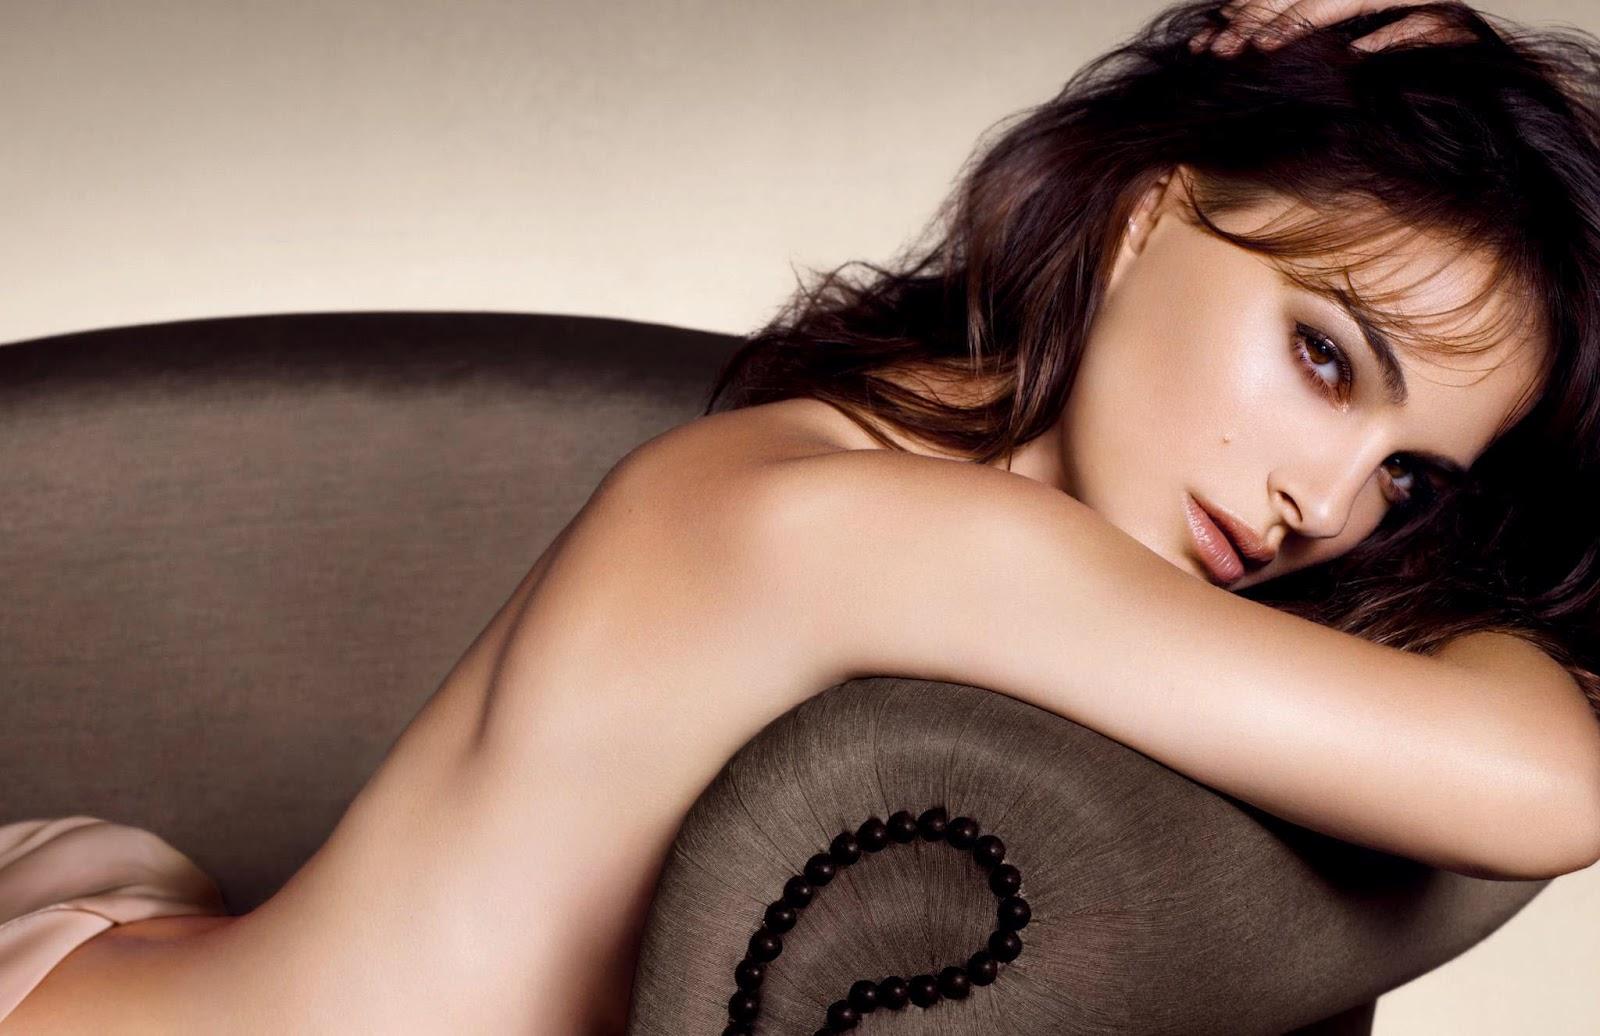 http://2.bp.blogspot.com/-NW9EbwVu8ow/UFRB6OVi_RI/AAAAAAAAevA/lVNMoTKVIJs/s1600/Natalie+Portman+-+Dior+%2527New+Nude%2527+Promos+0+.jpg